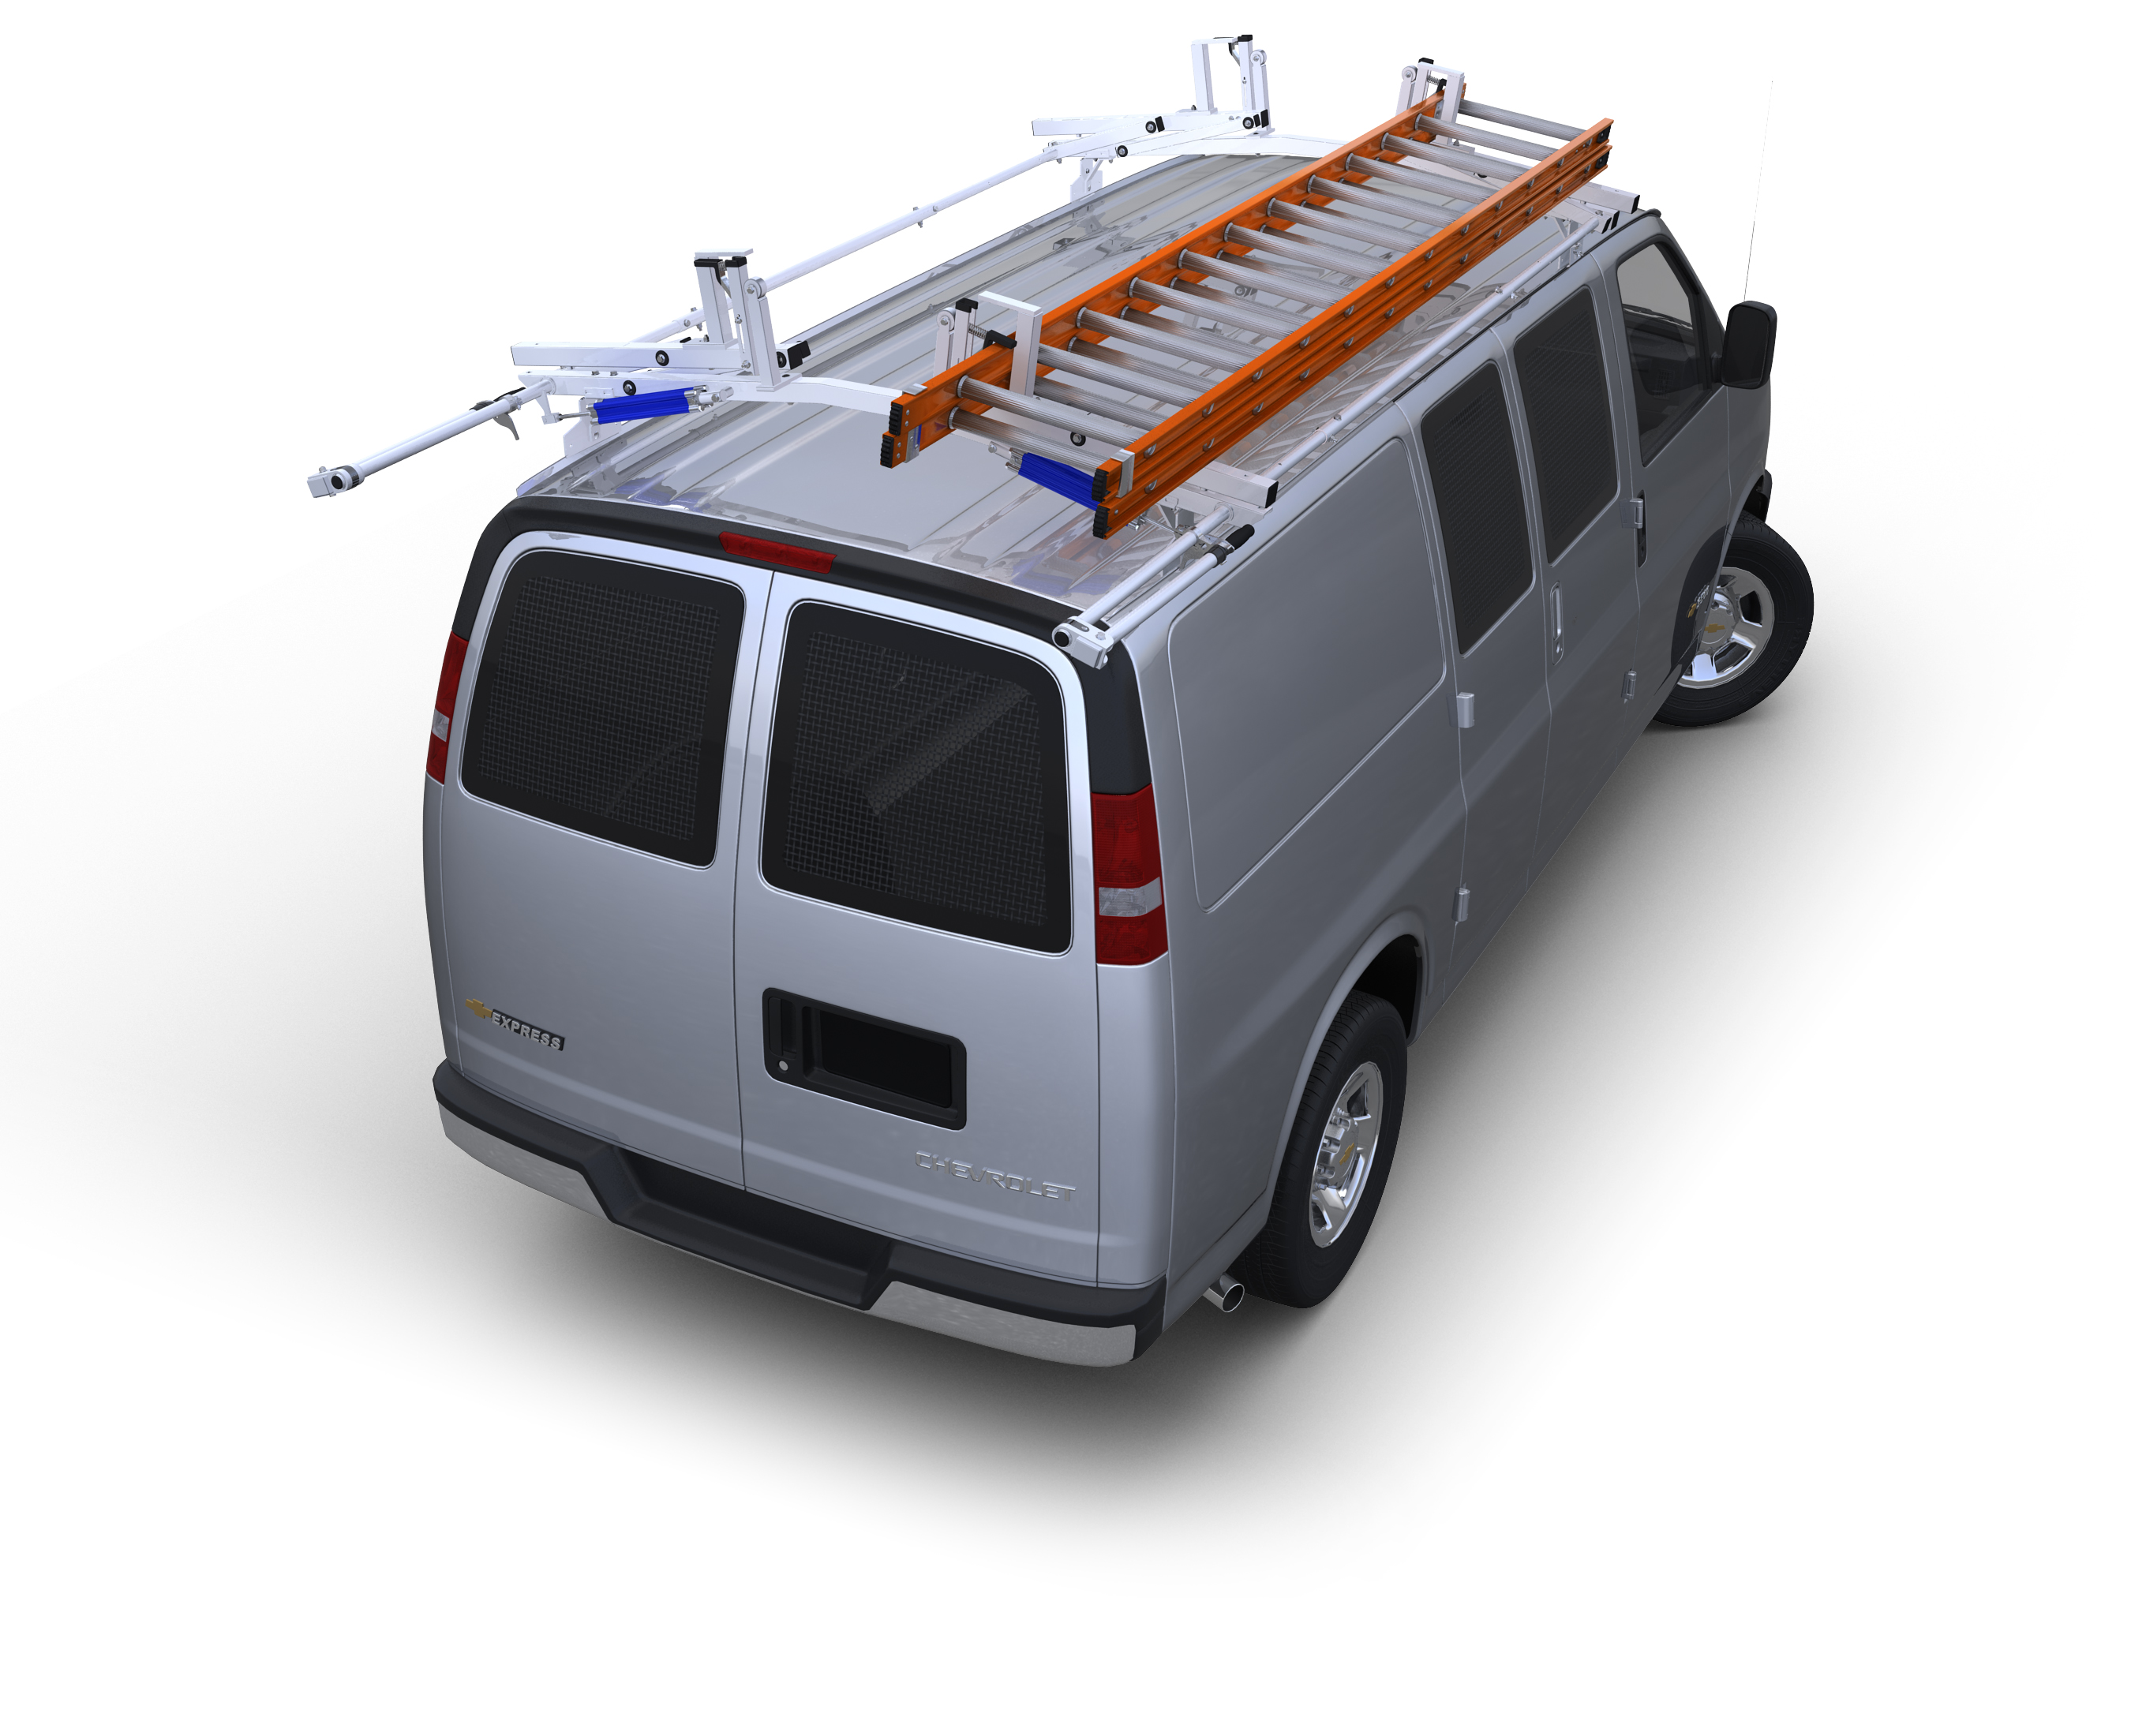 "MB Sprinter 144""WB Std. Roof Base Van Package, Aluminum Shelving - SAVE $150!"